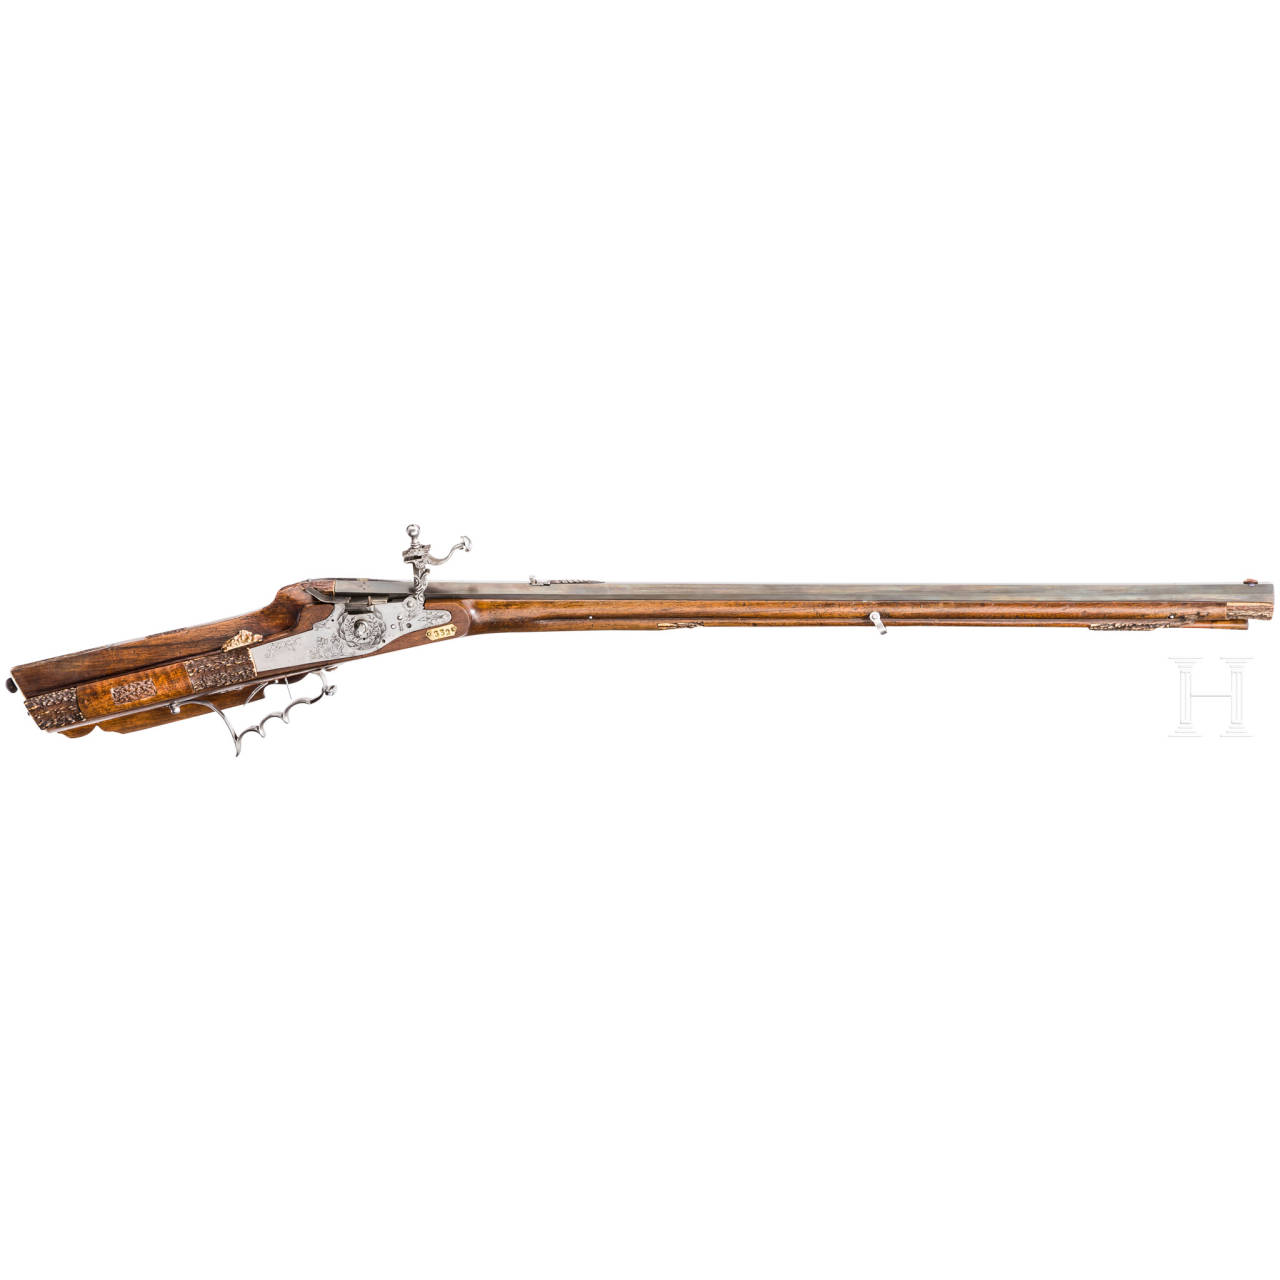 A wheellock rifle, Johann Krach of Salzburg, dated 1657